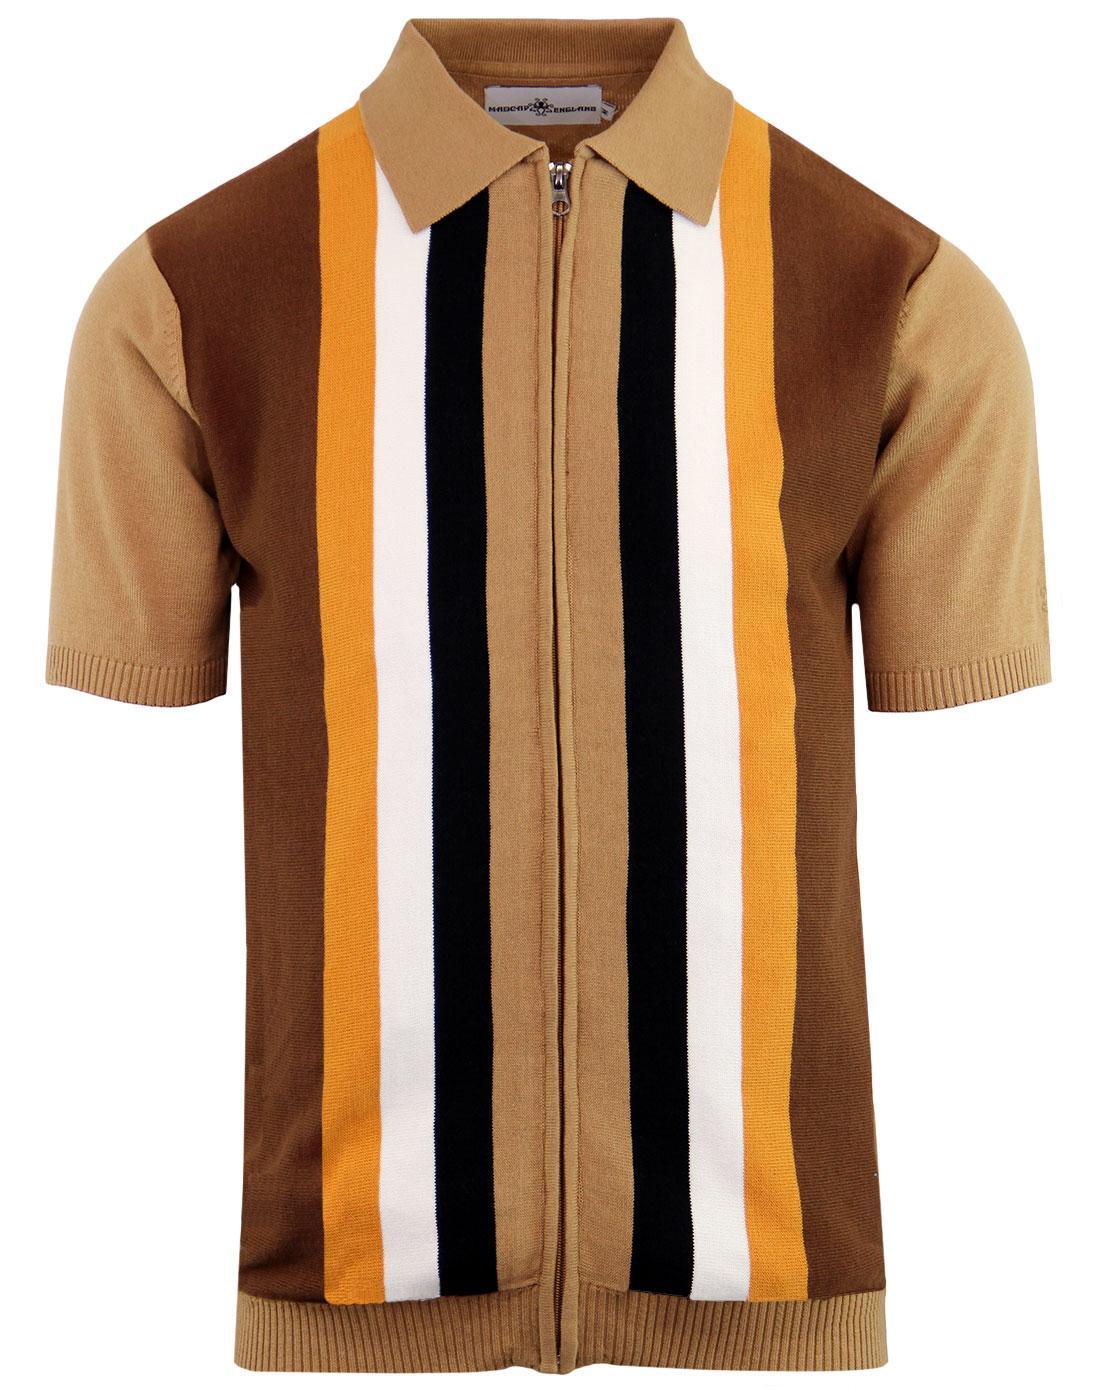 Victor MADCAP ENGLAND 60s Mod Stripe Zip Polo TAN